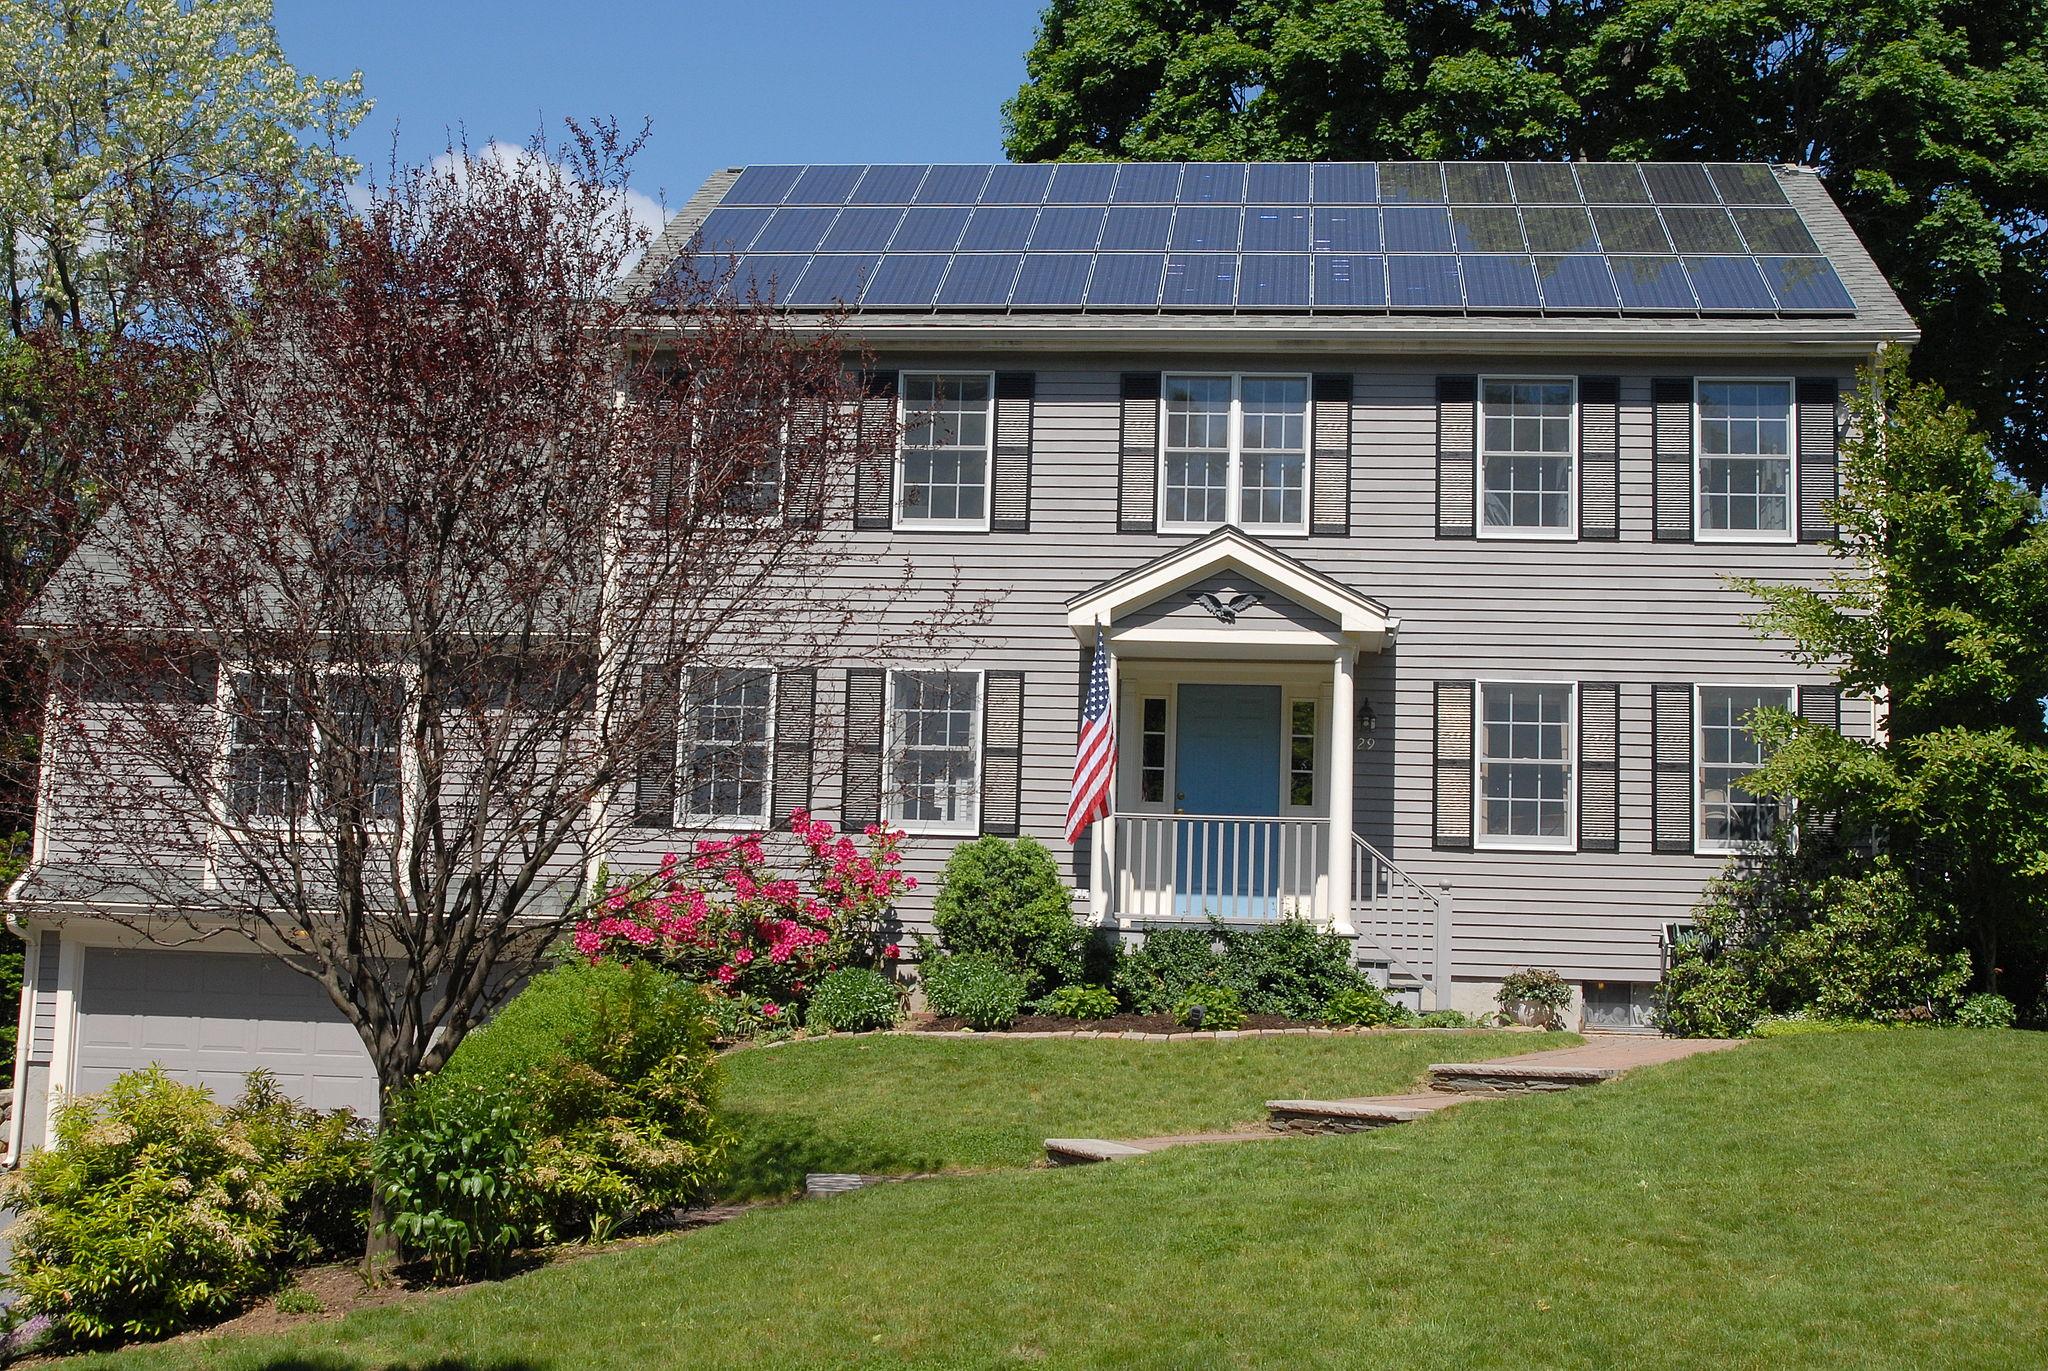 2048px-Solar_panels_on_house_roof.jpg